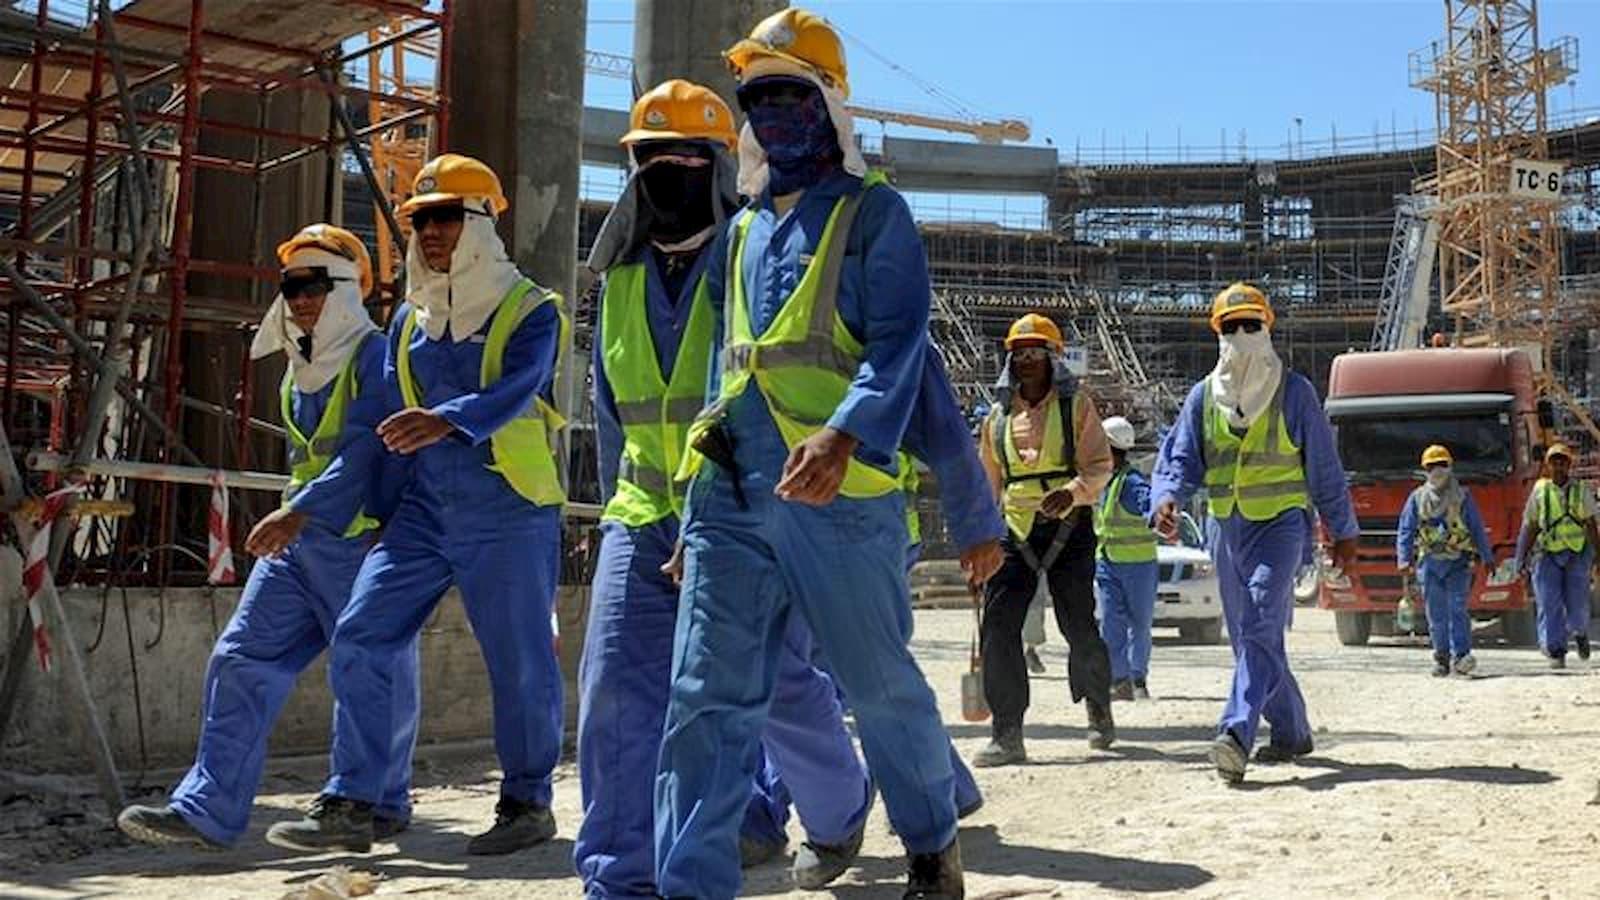 Qatar to abolish kafala system by January 2020